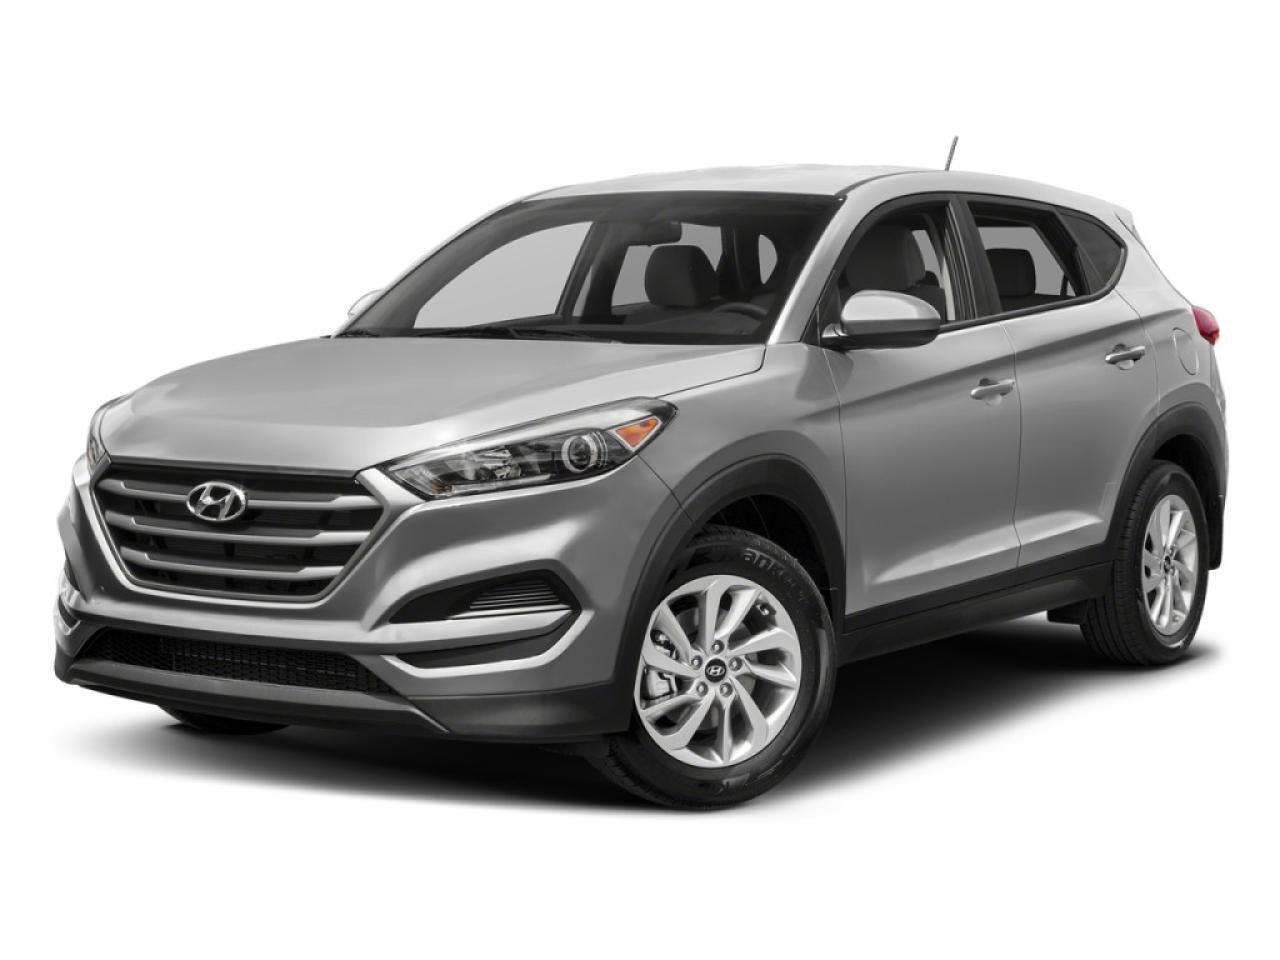 2018 Hyundai Tucson 2.0L FWD SE NO OPTIONS